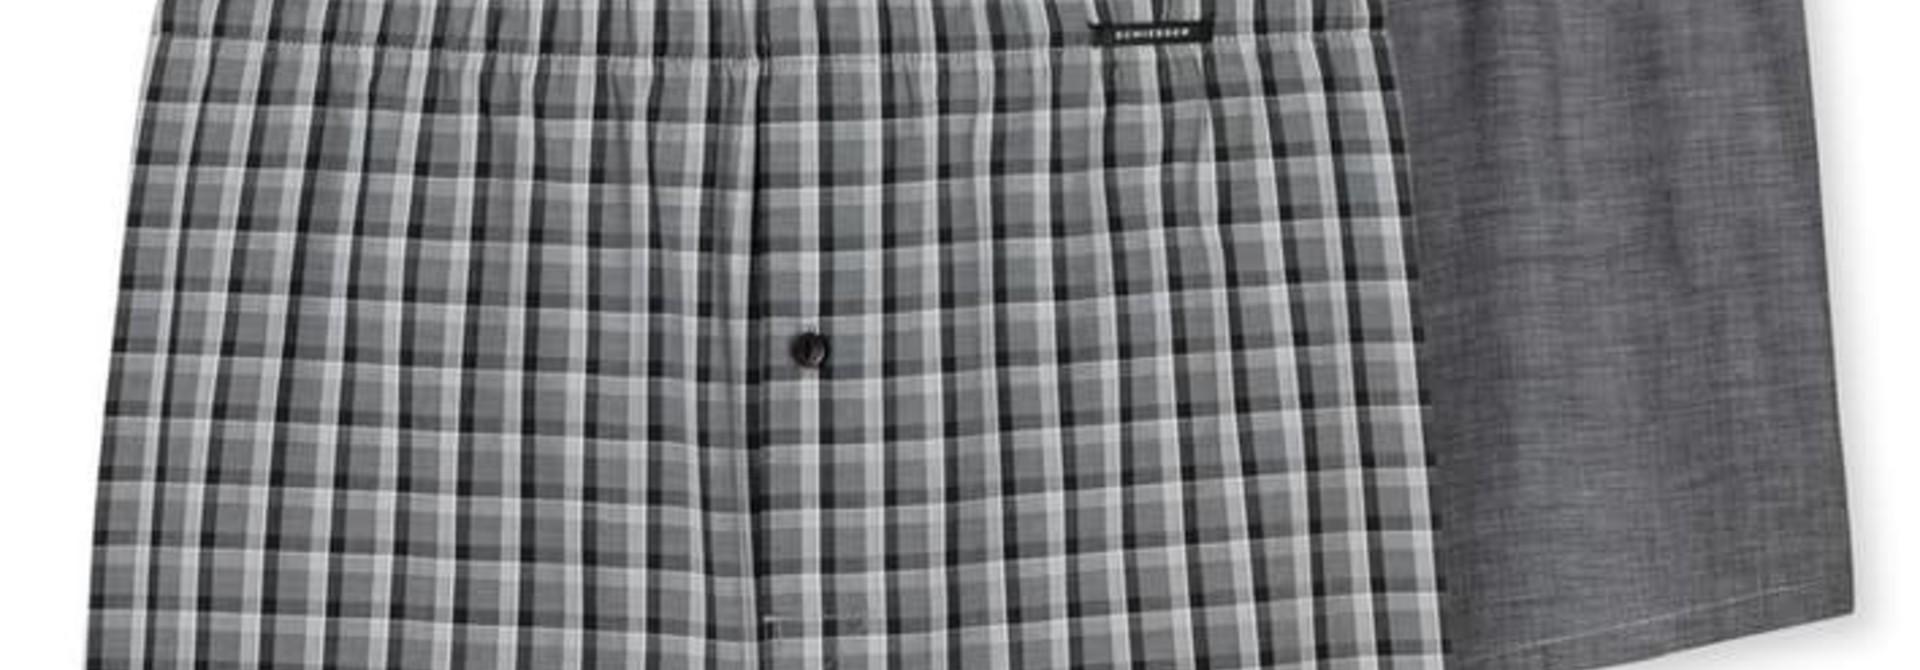 Boxershort 2-Pack 168445 - zwart